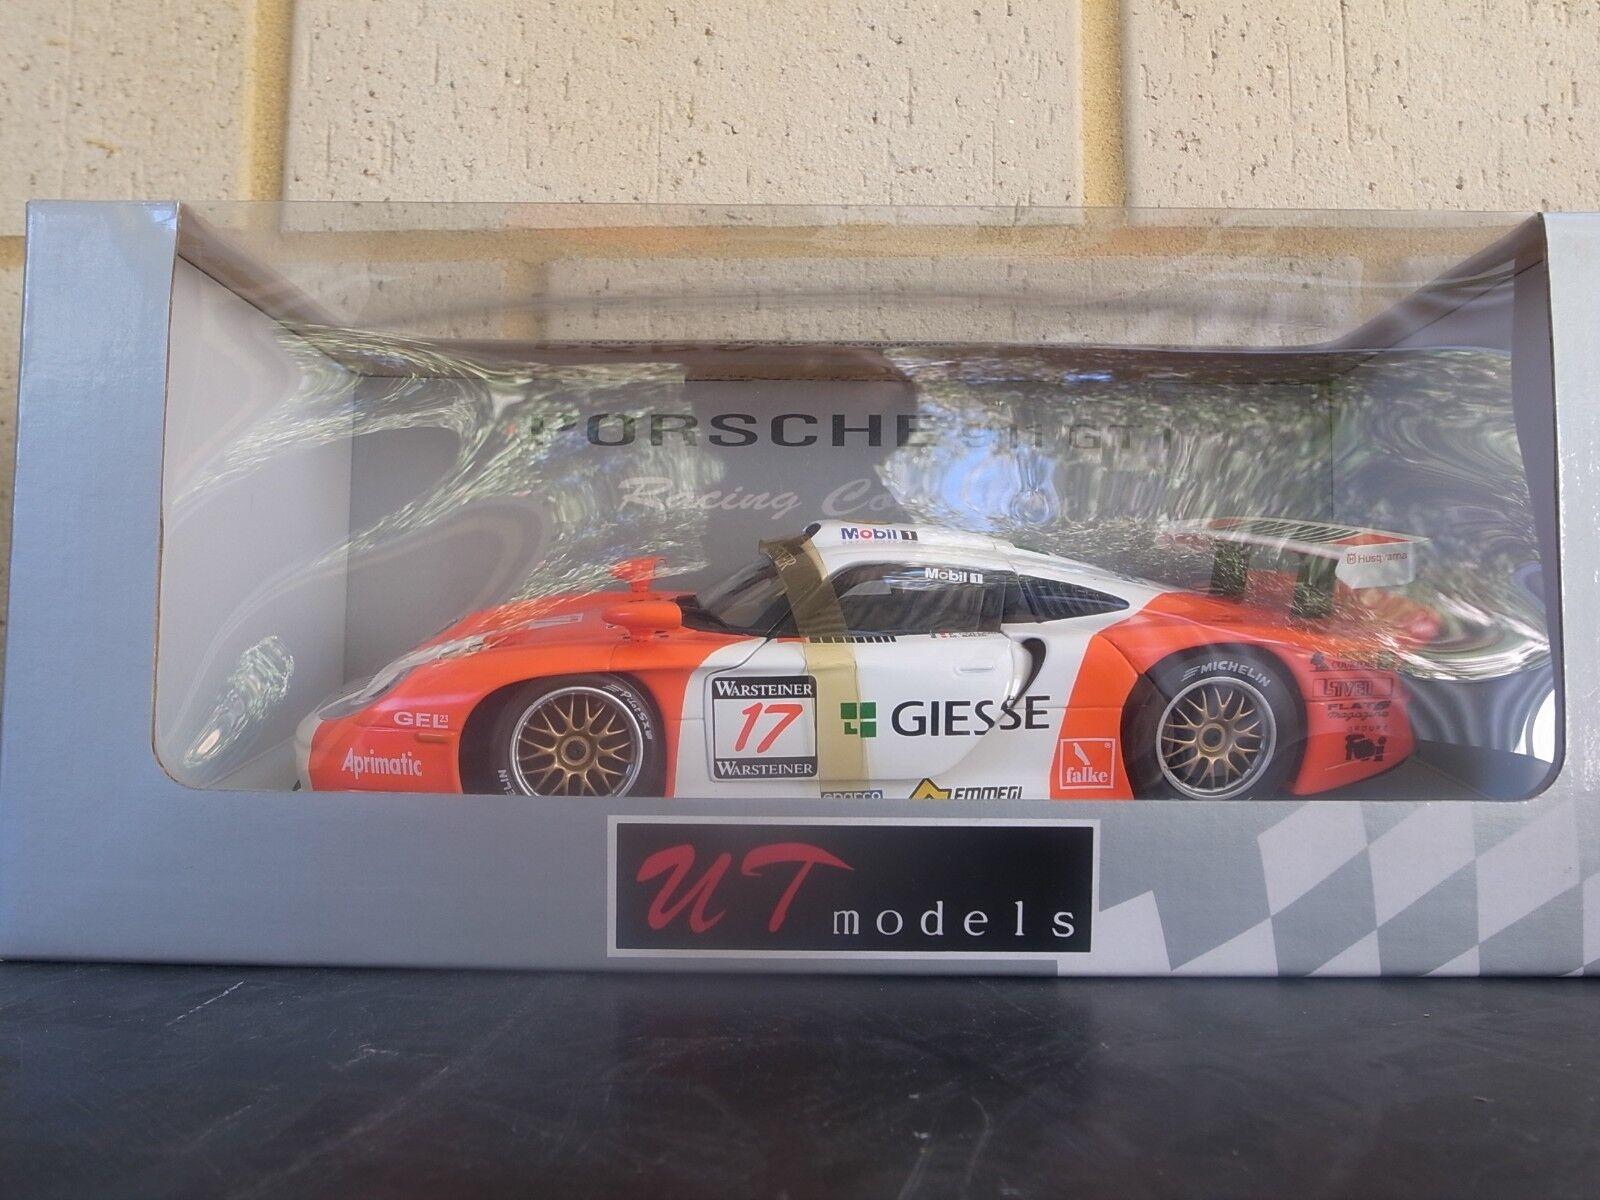 UT Models 1 18 Scale diecast 16MAY2018D8 Porsche 911 GT1 Giesse